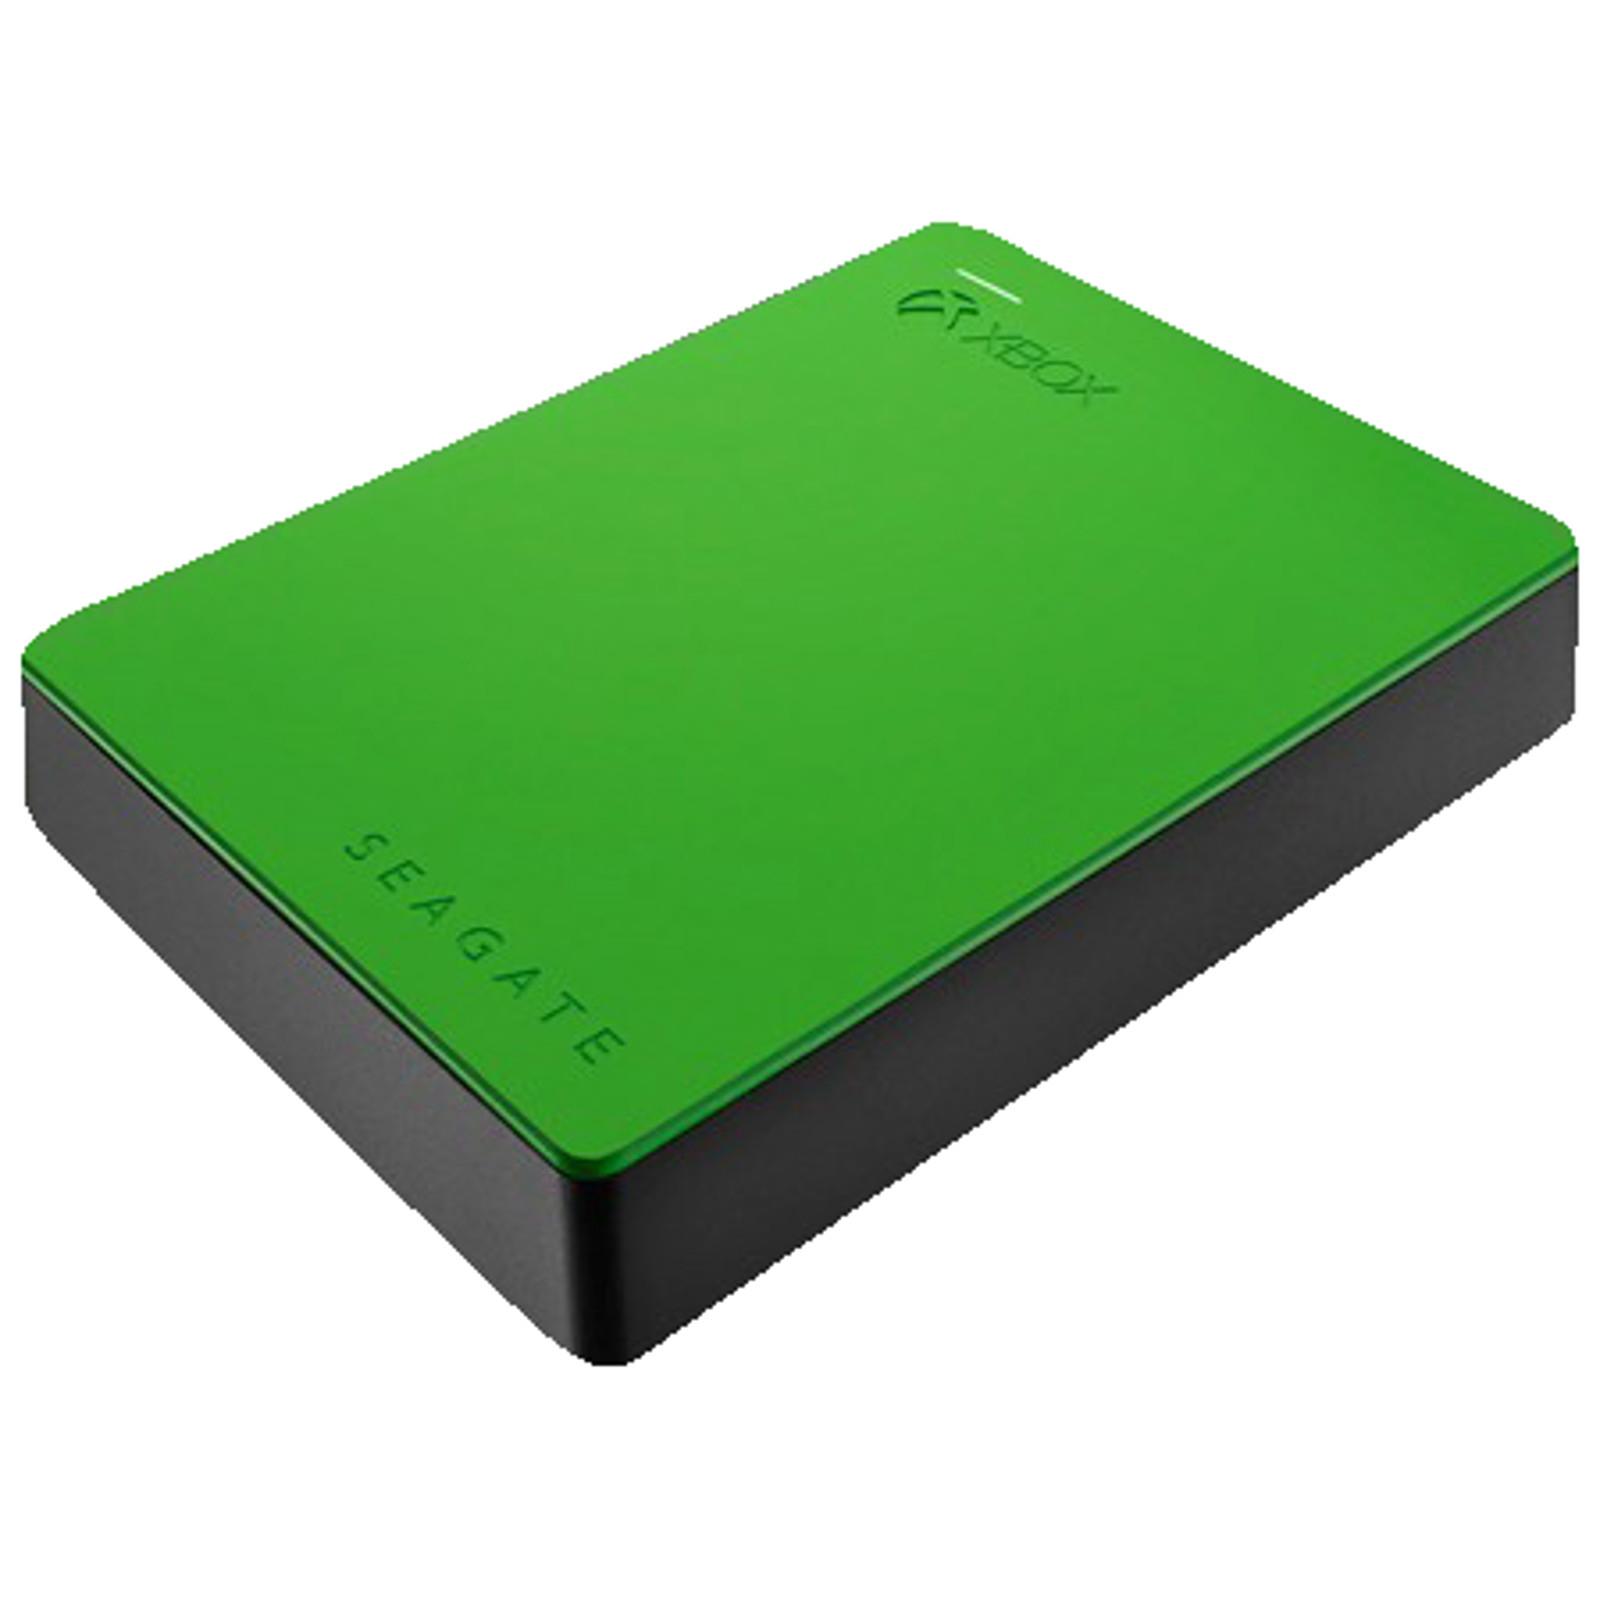 "SEAGATE Game Drive 4 TB externe Festplatte ( Xbox ) STEA4000402 Ebay Plus 2,5"""